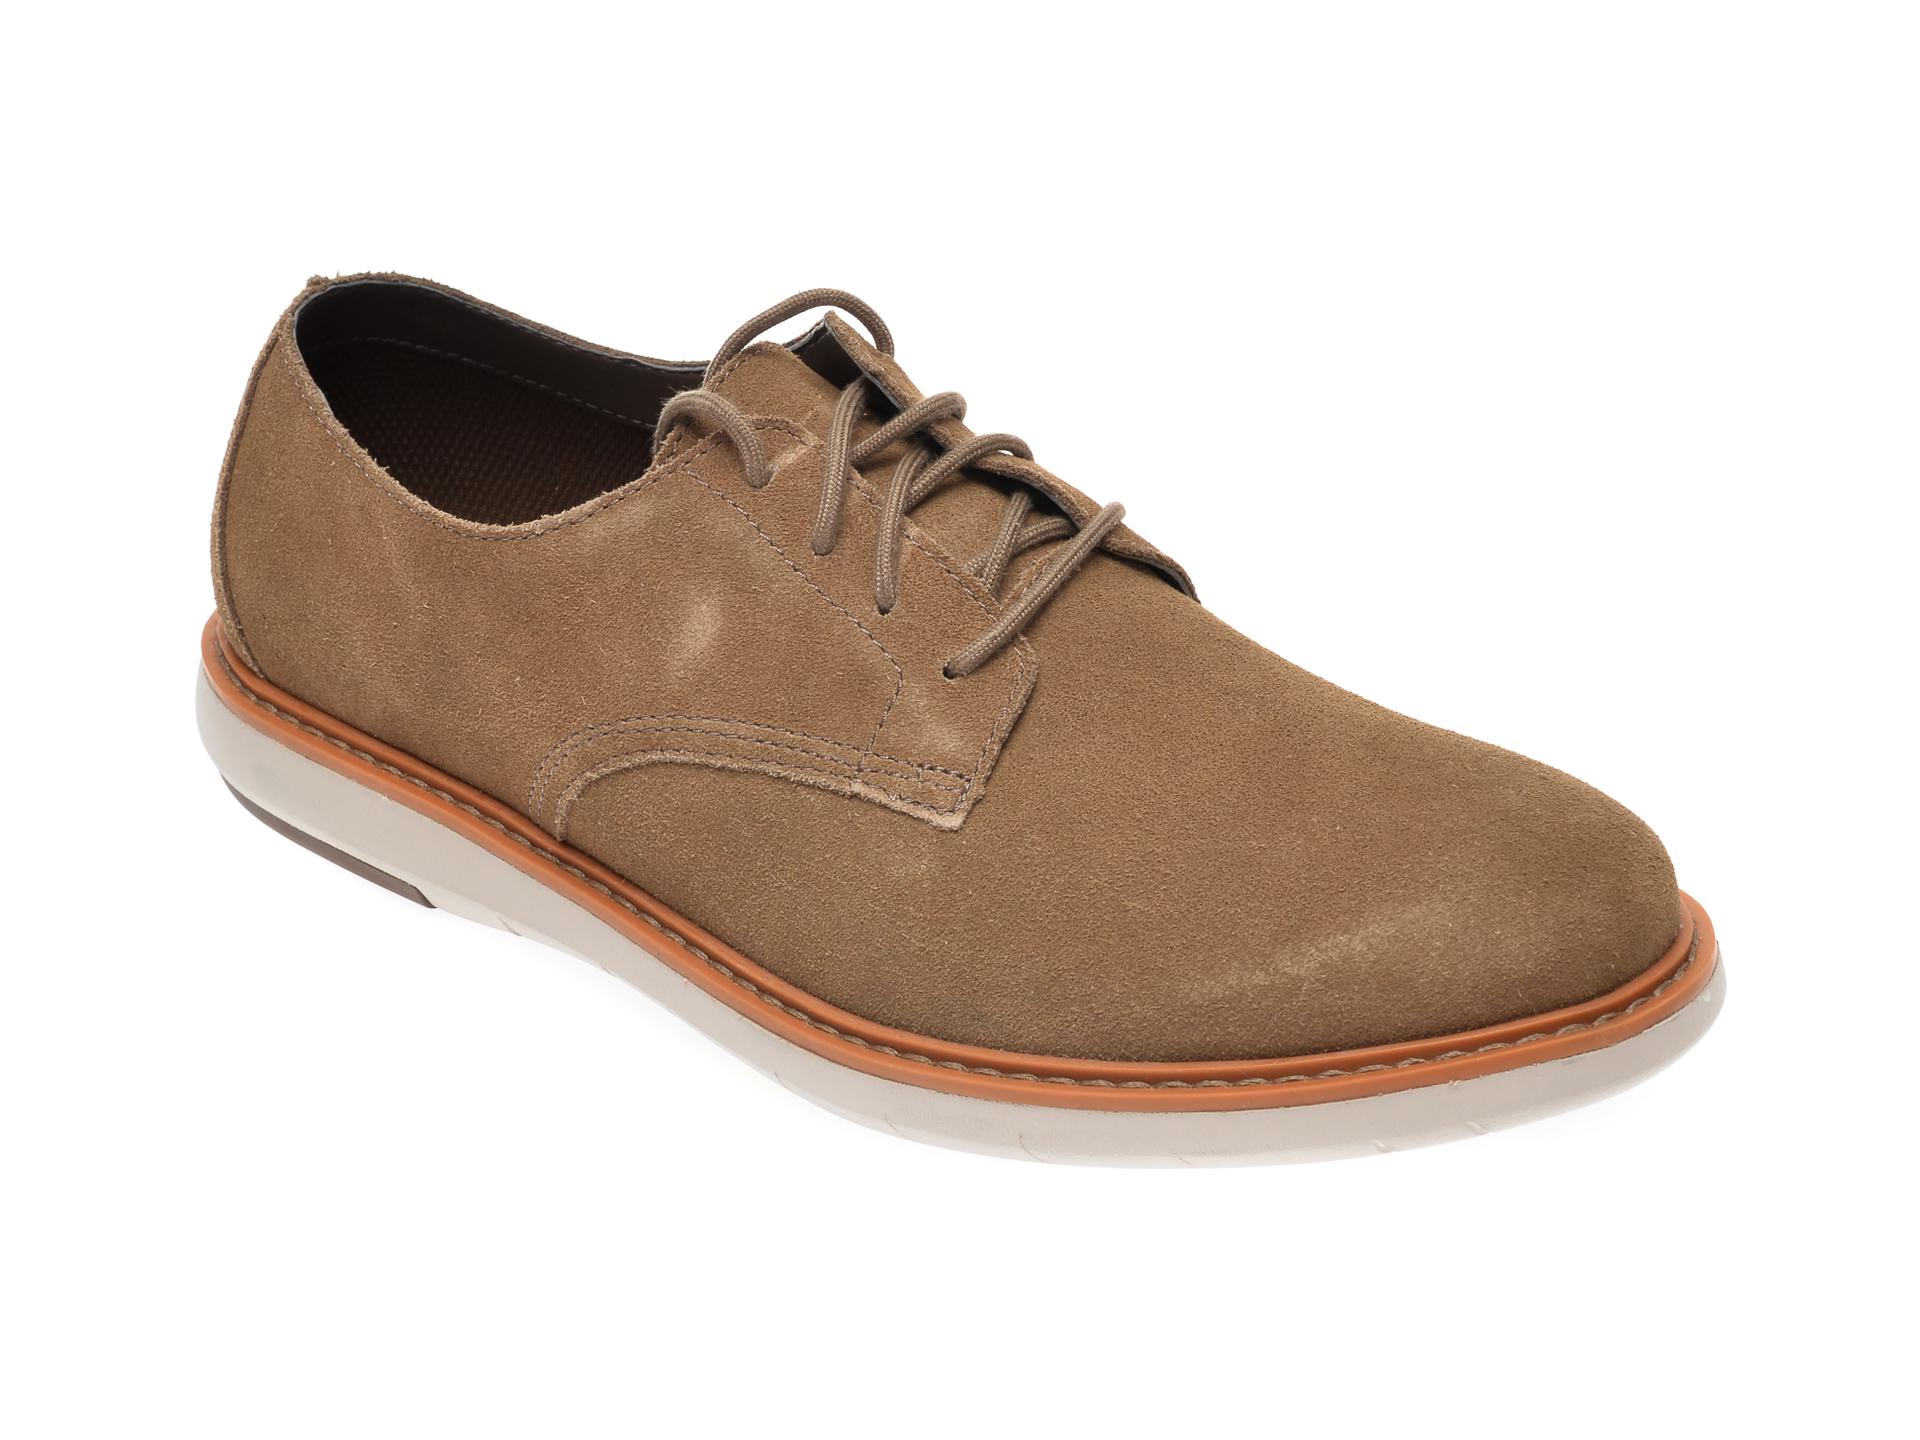 Pantofi CLARKS kaki, Draper Lace, din piele intoarsa imagine